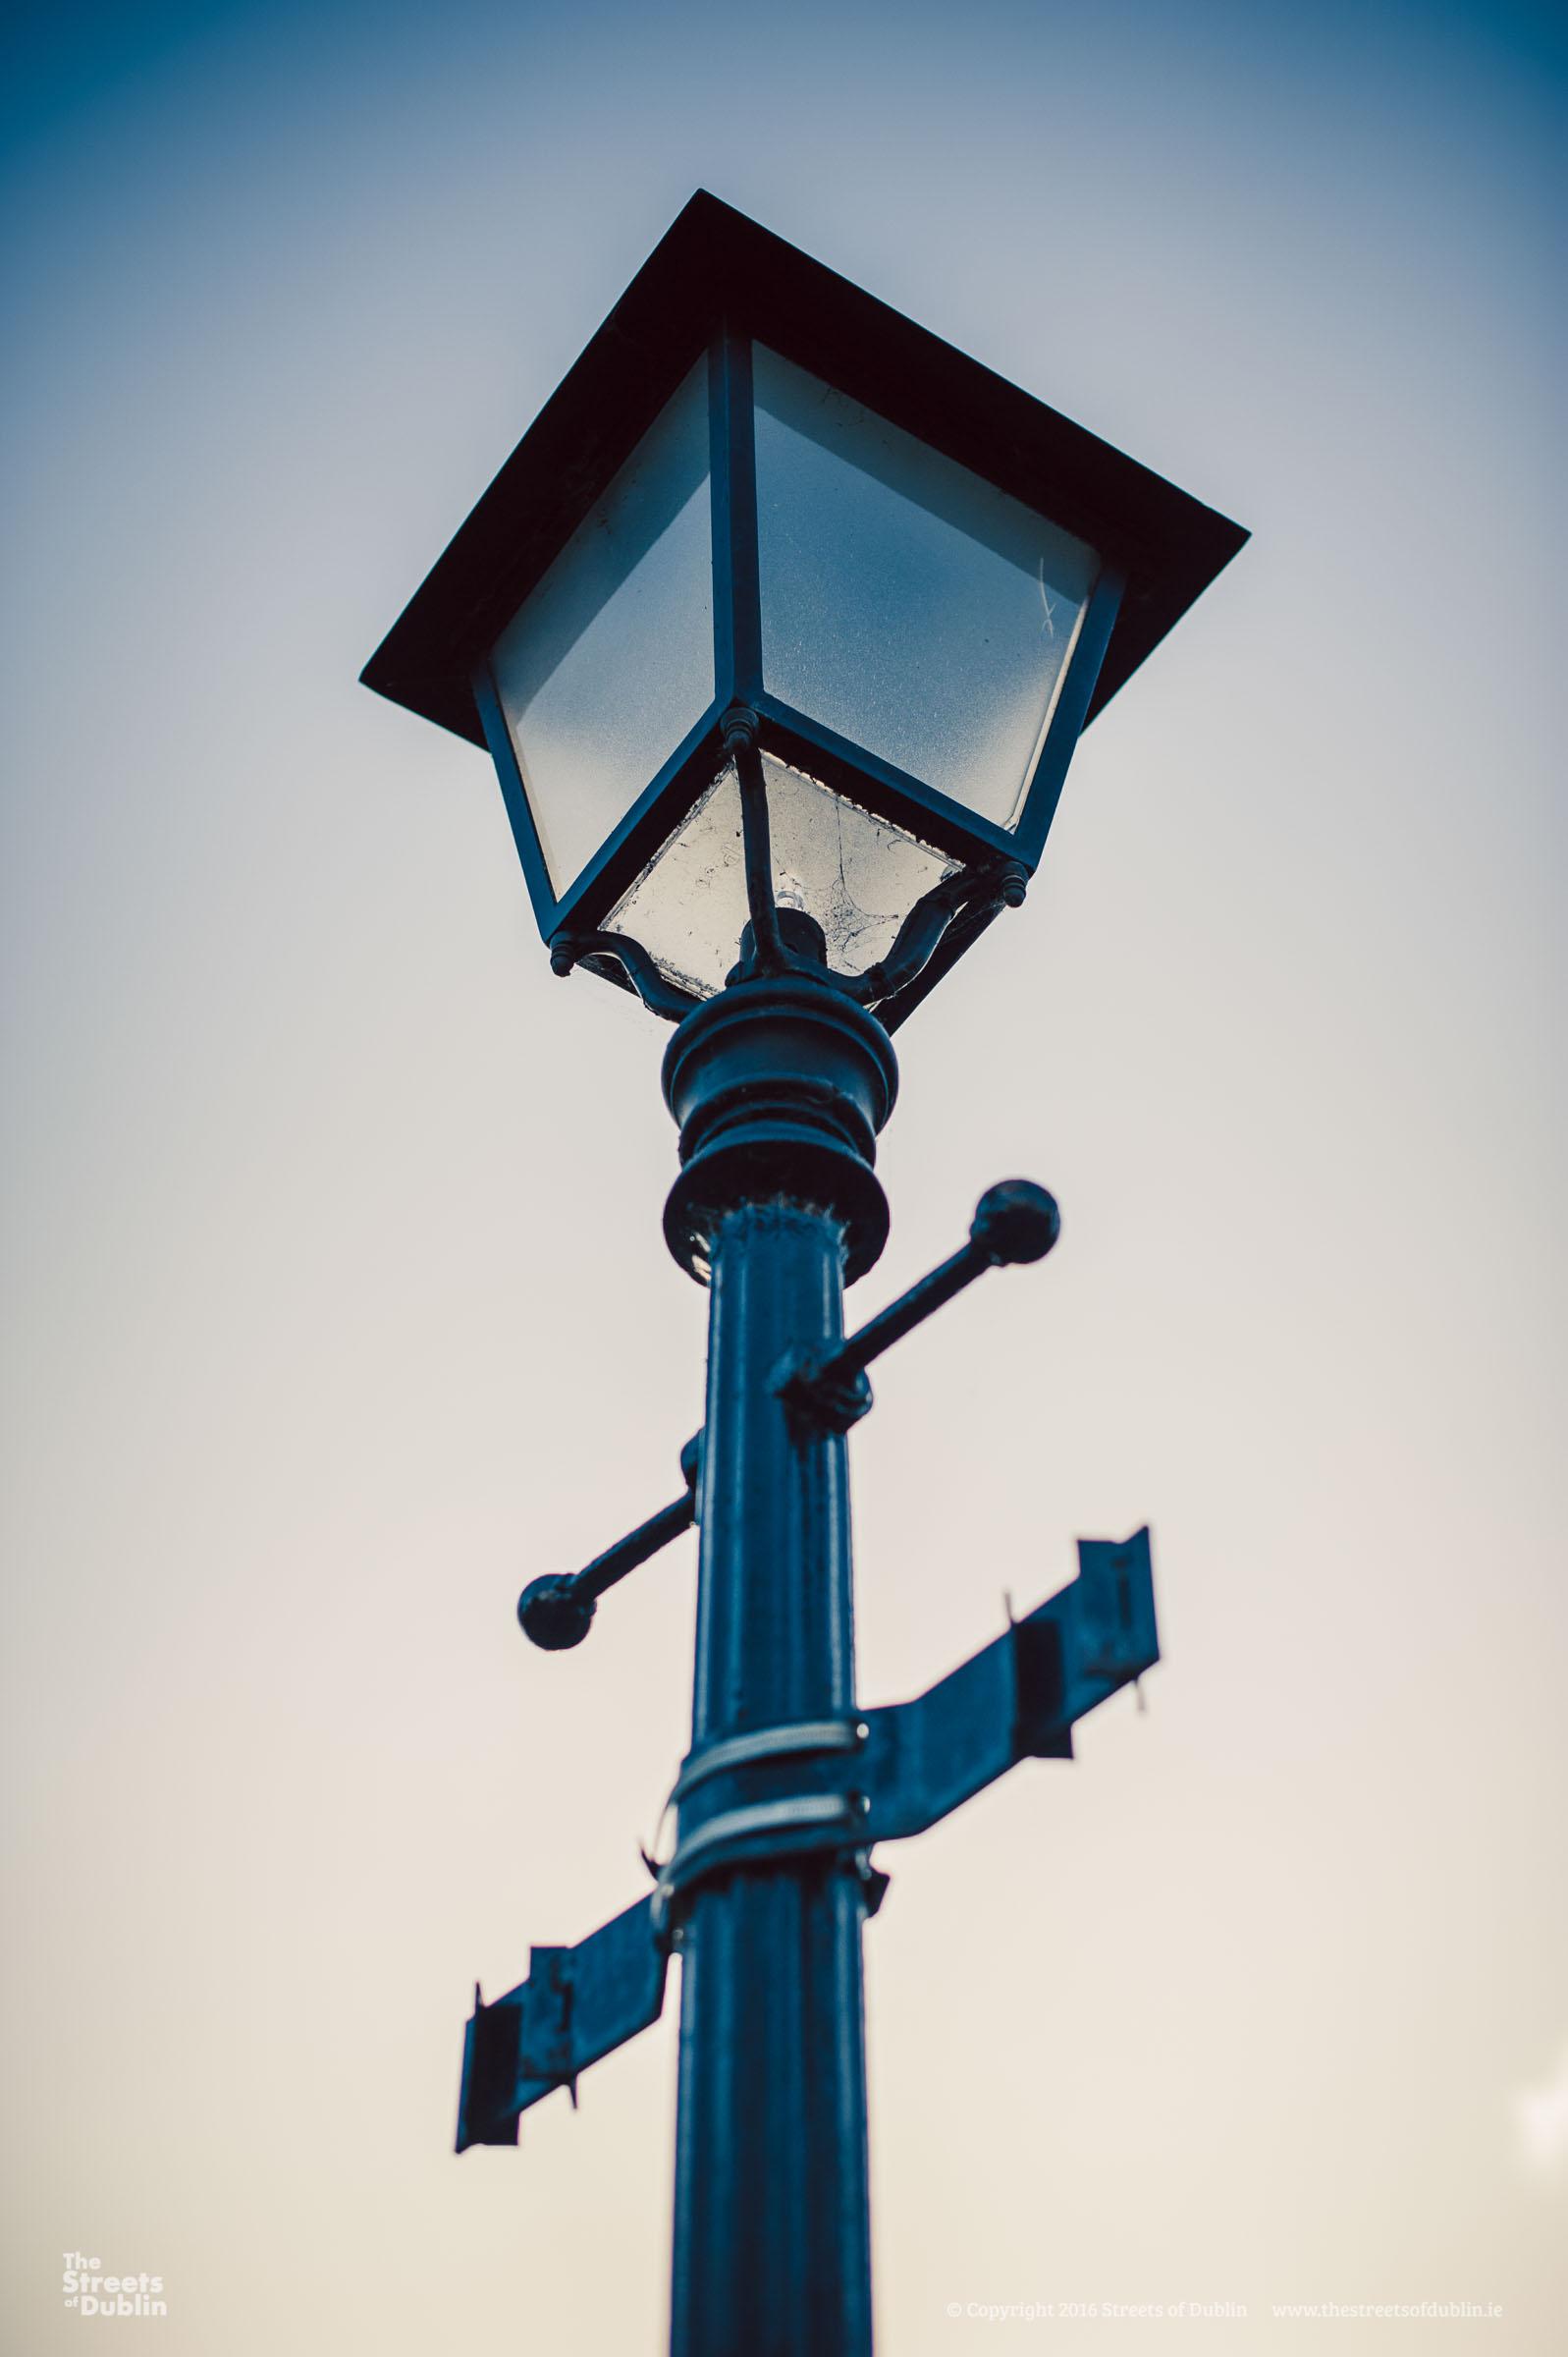 Streets-of-Dublin-Photo-4-5.jpg